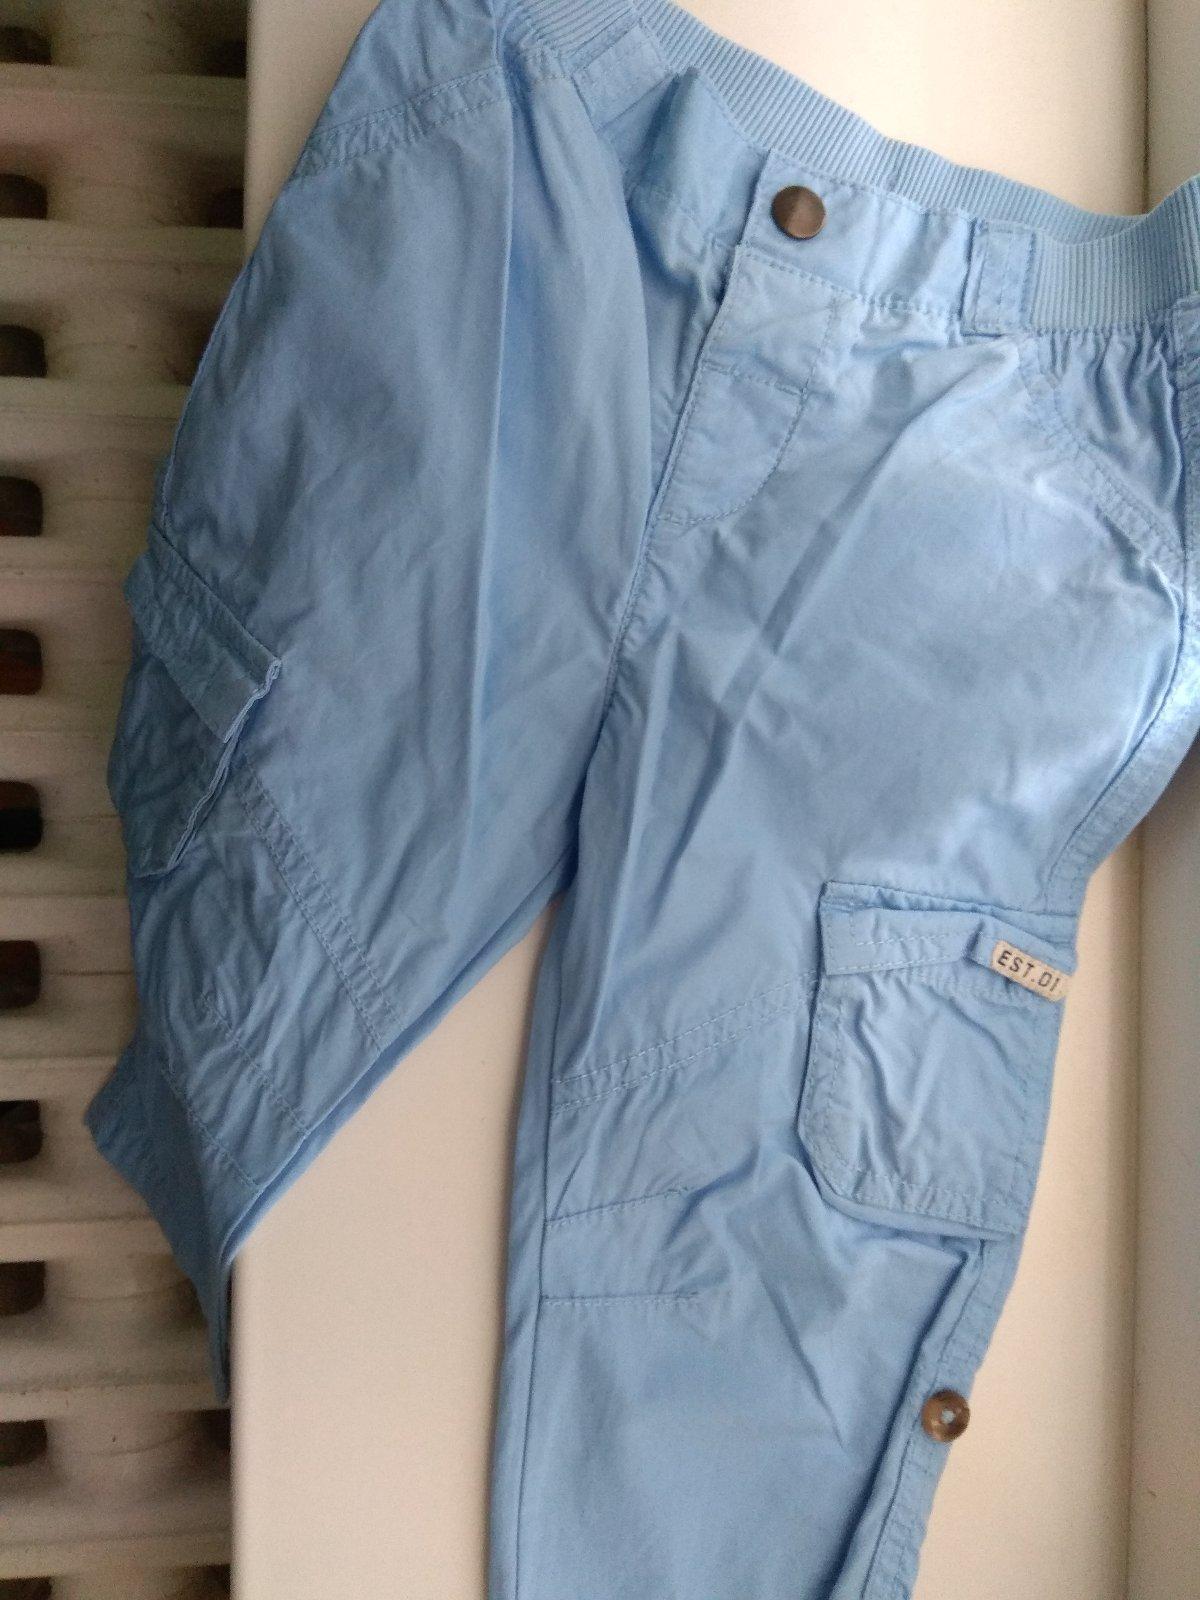 Modré tenké nohavice - Obrázok č. 1